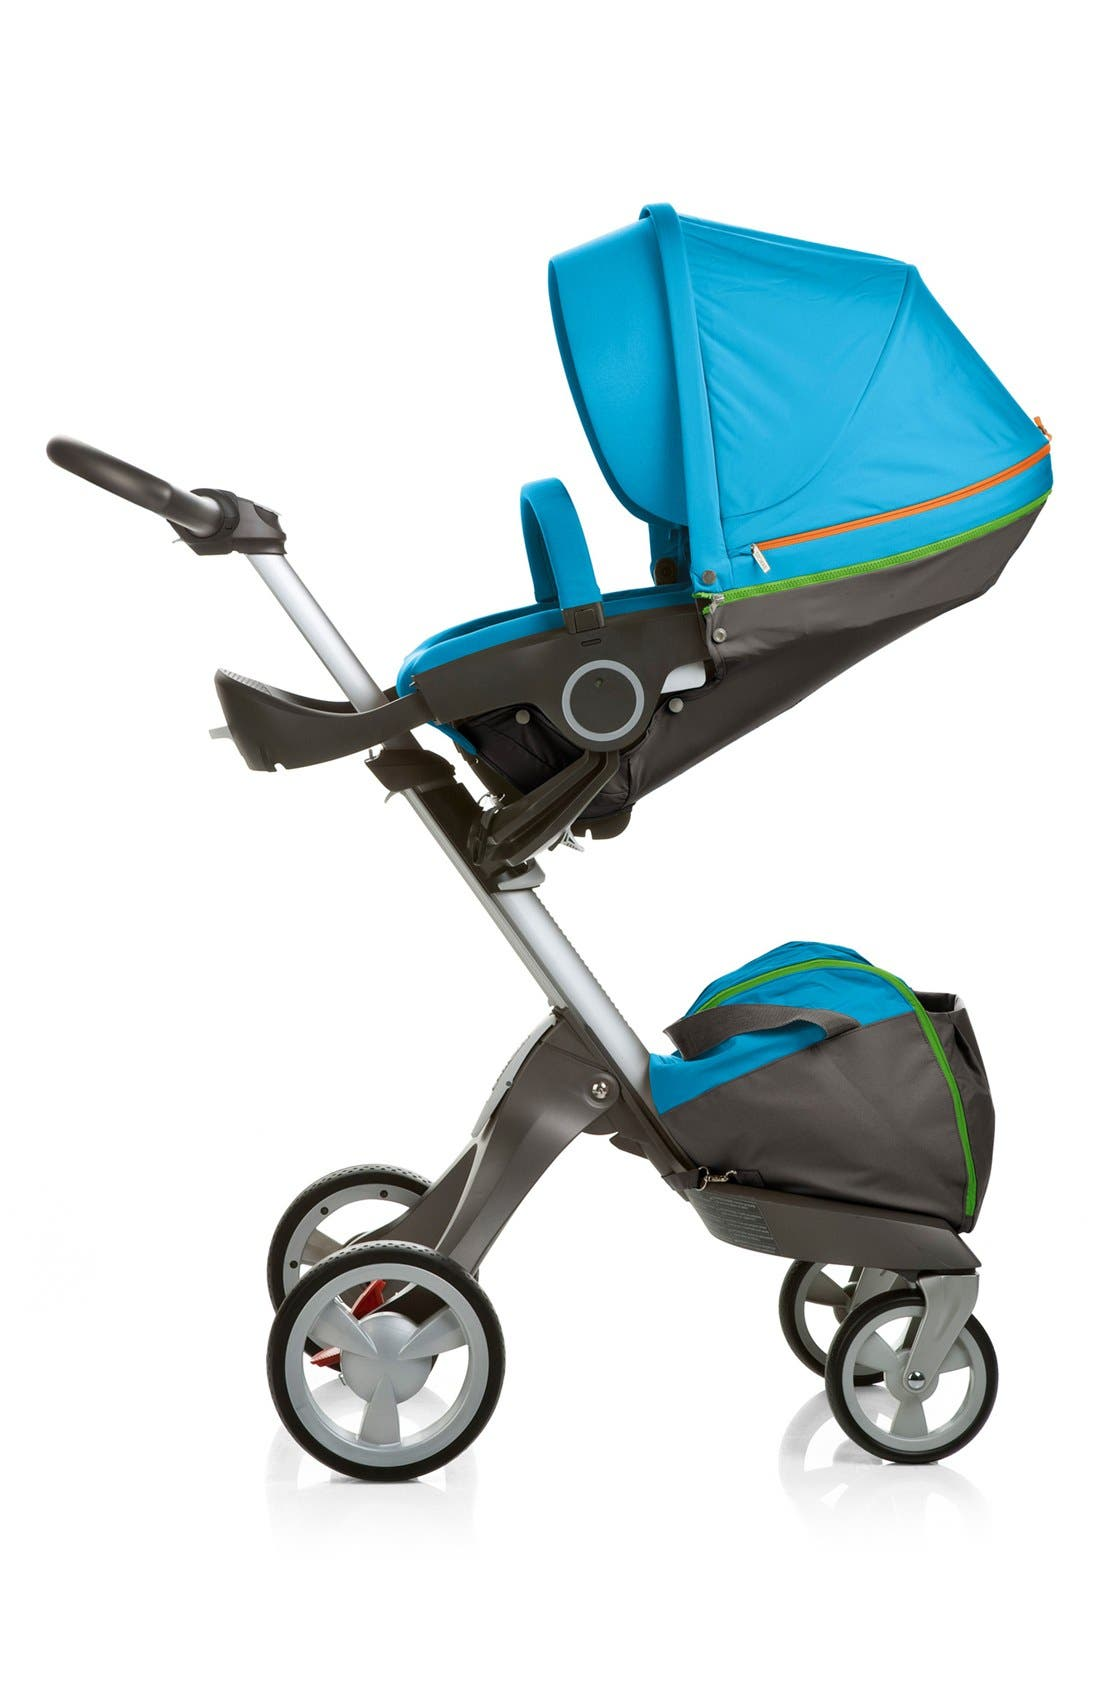 Stokke 'Xplory®' Stroller & Accessories